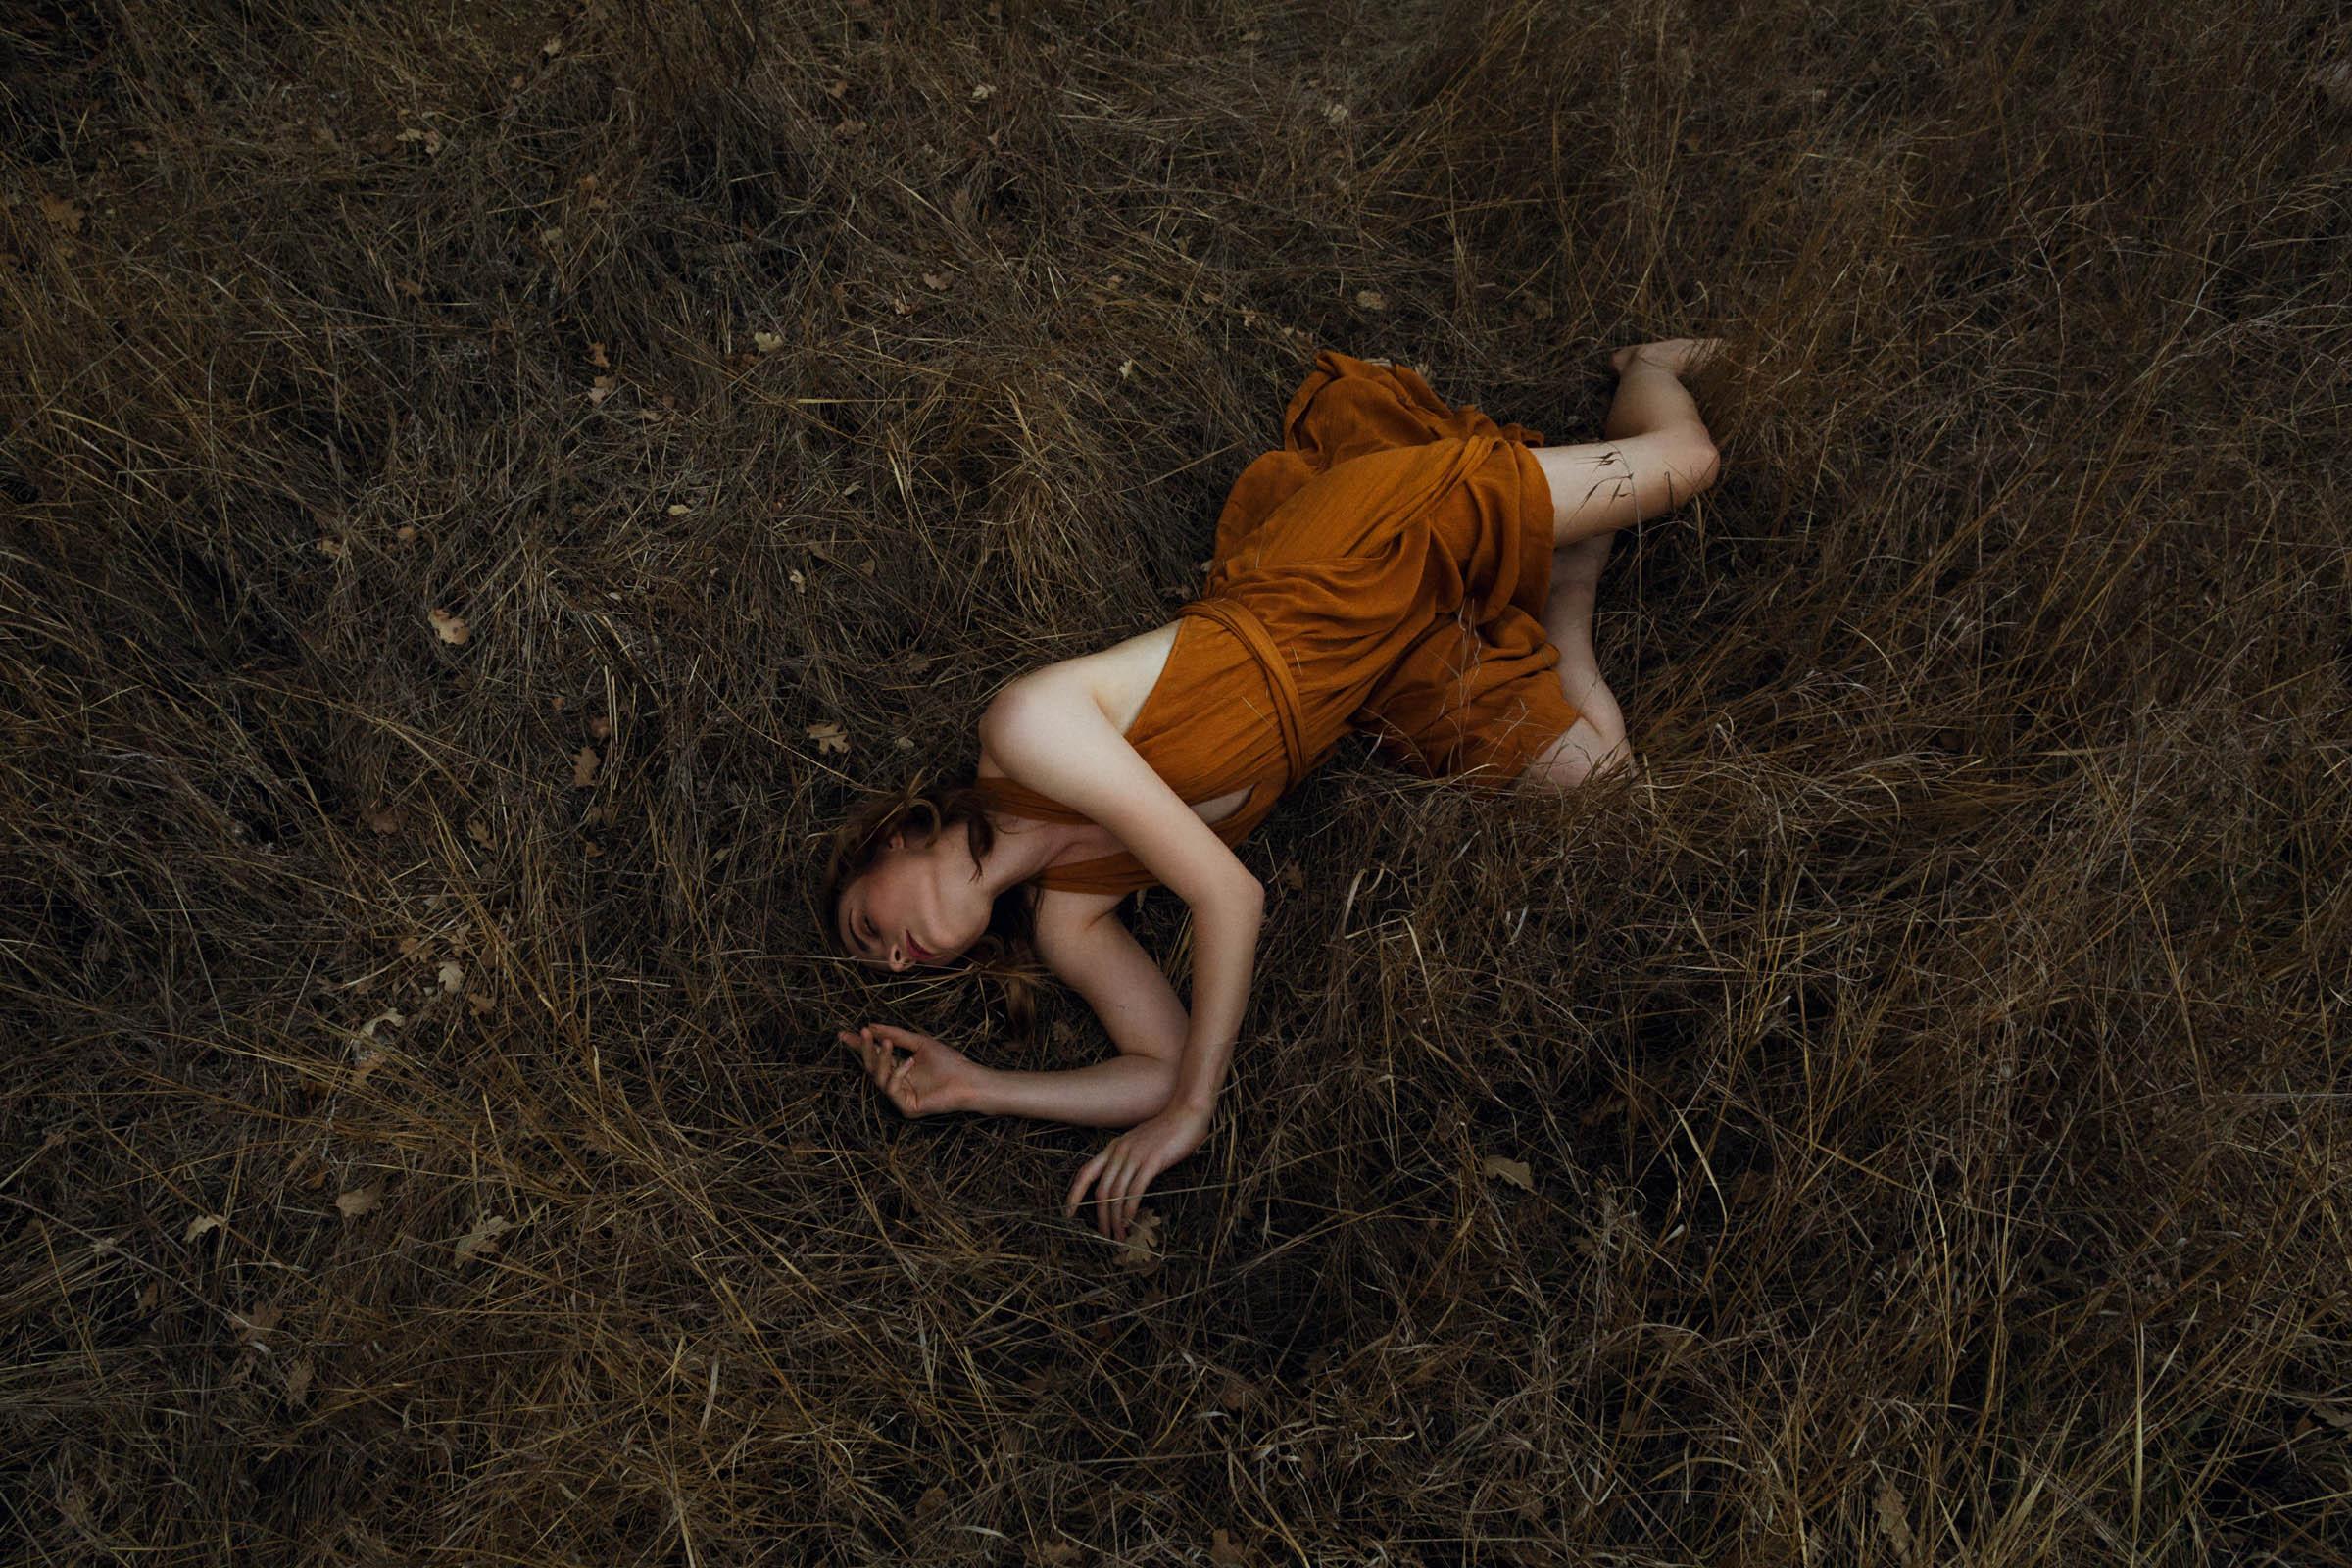 meredith-grass-016.jpg